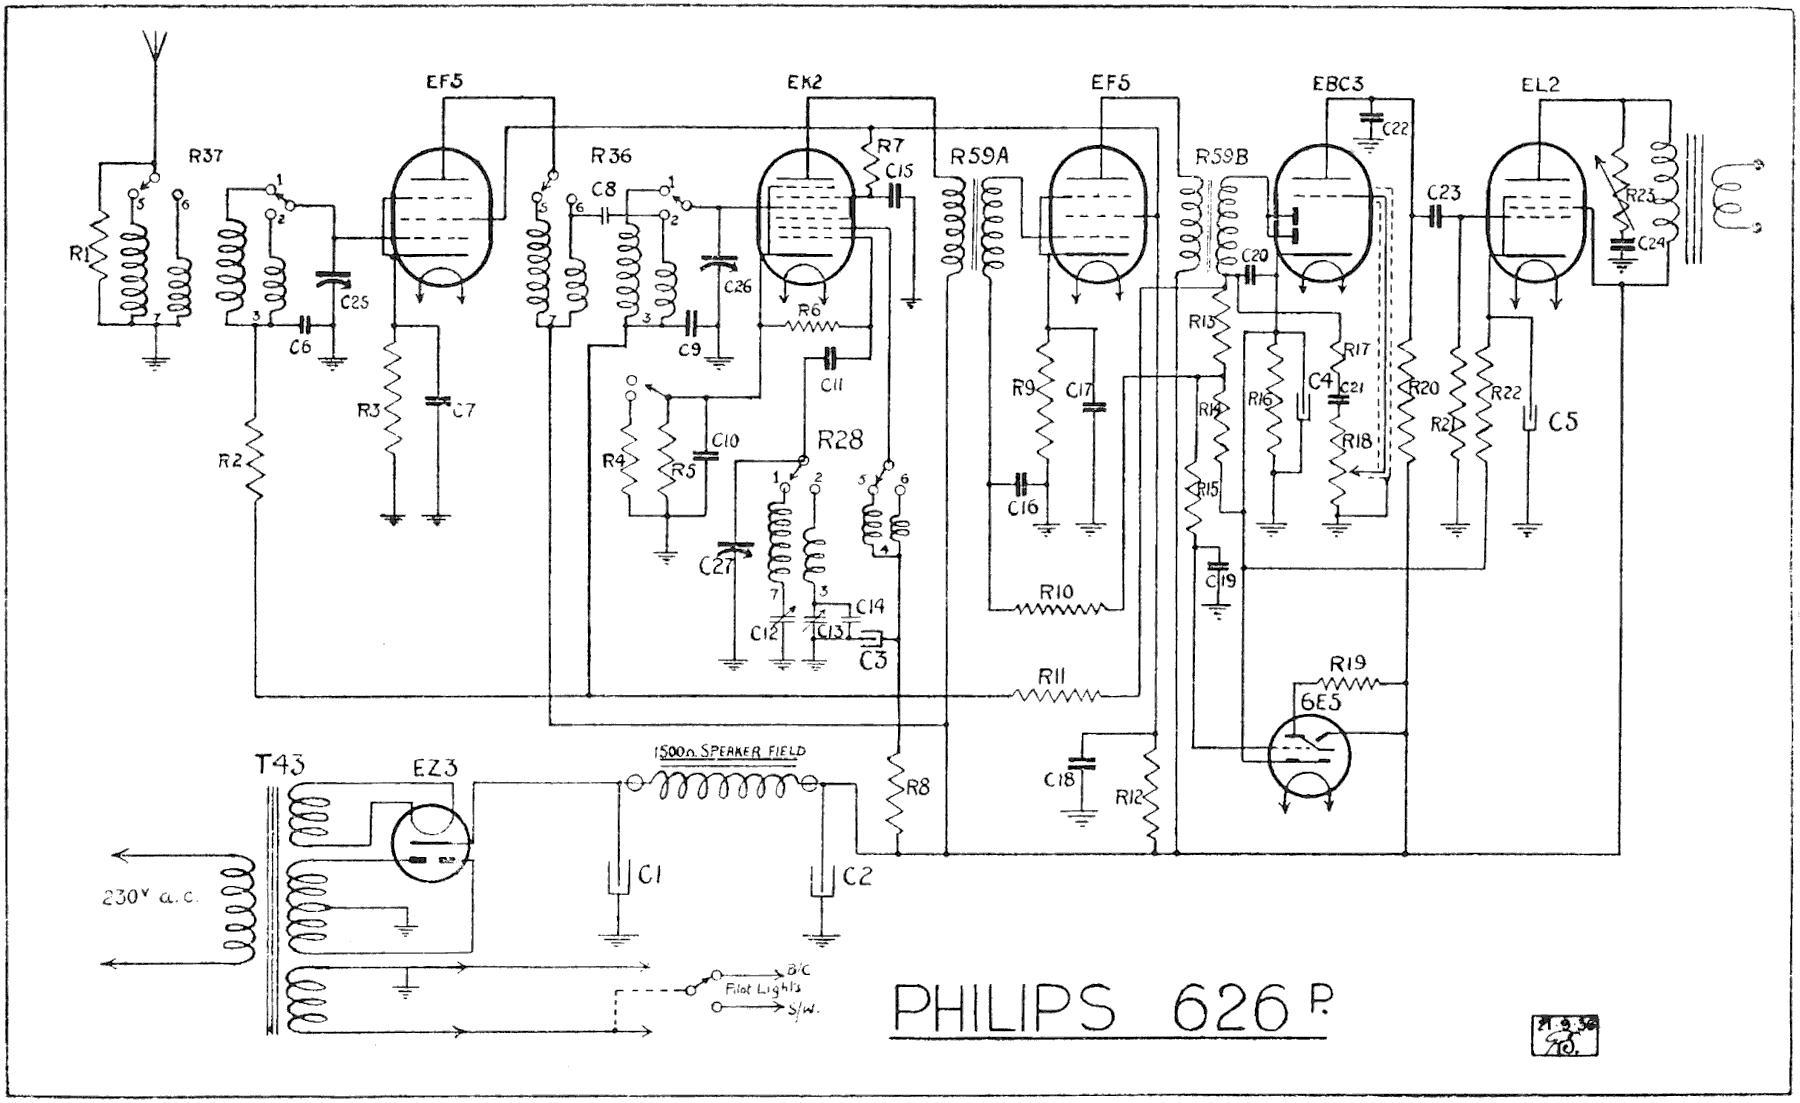 Philips P626